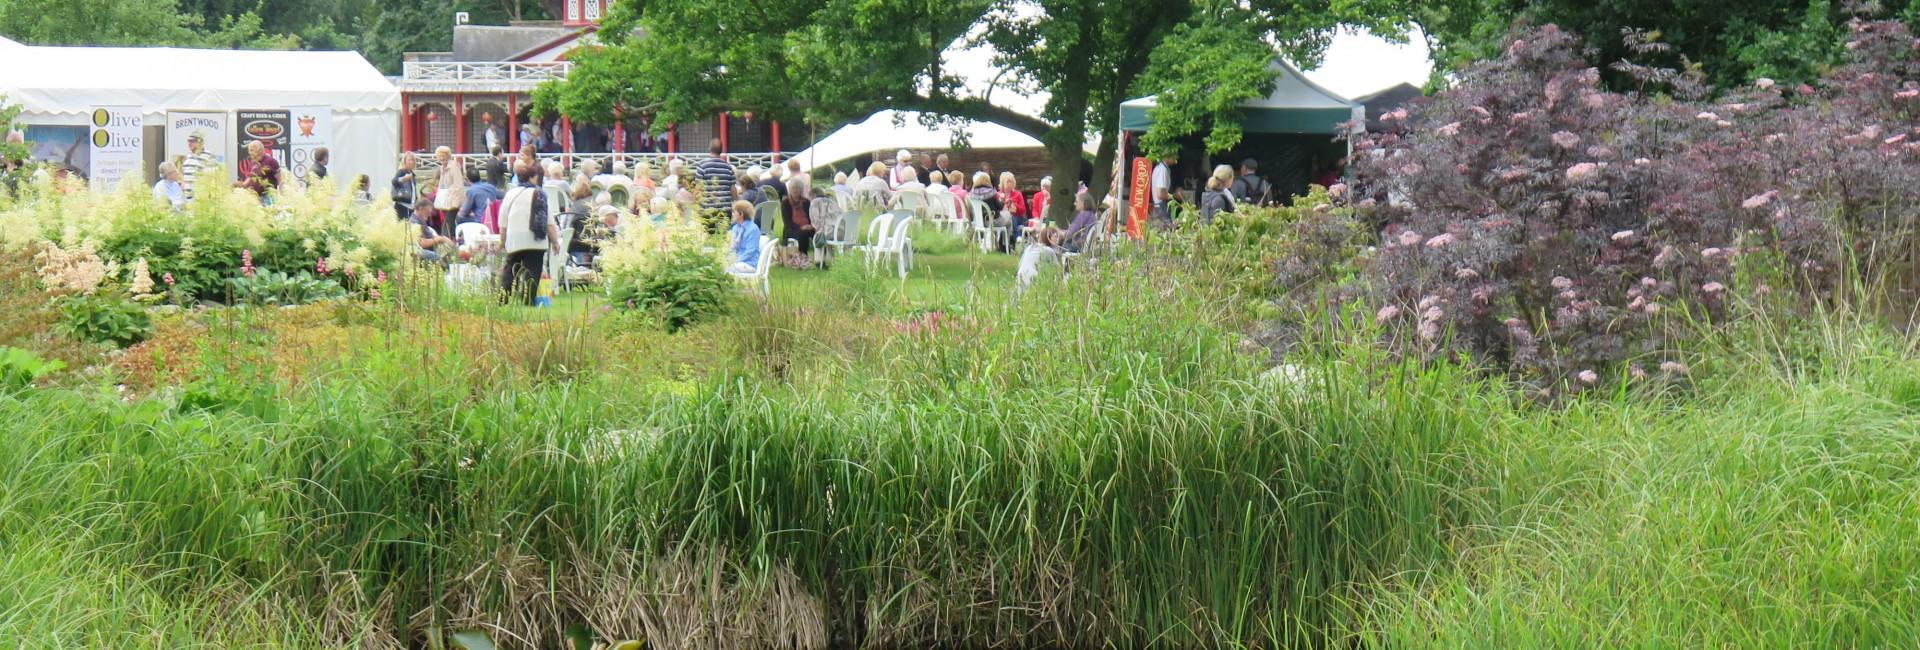 Woburn Abbey Garden Show